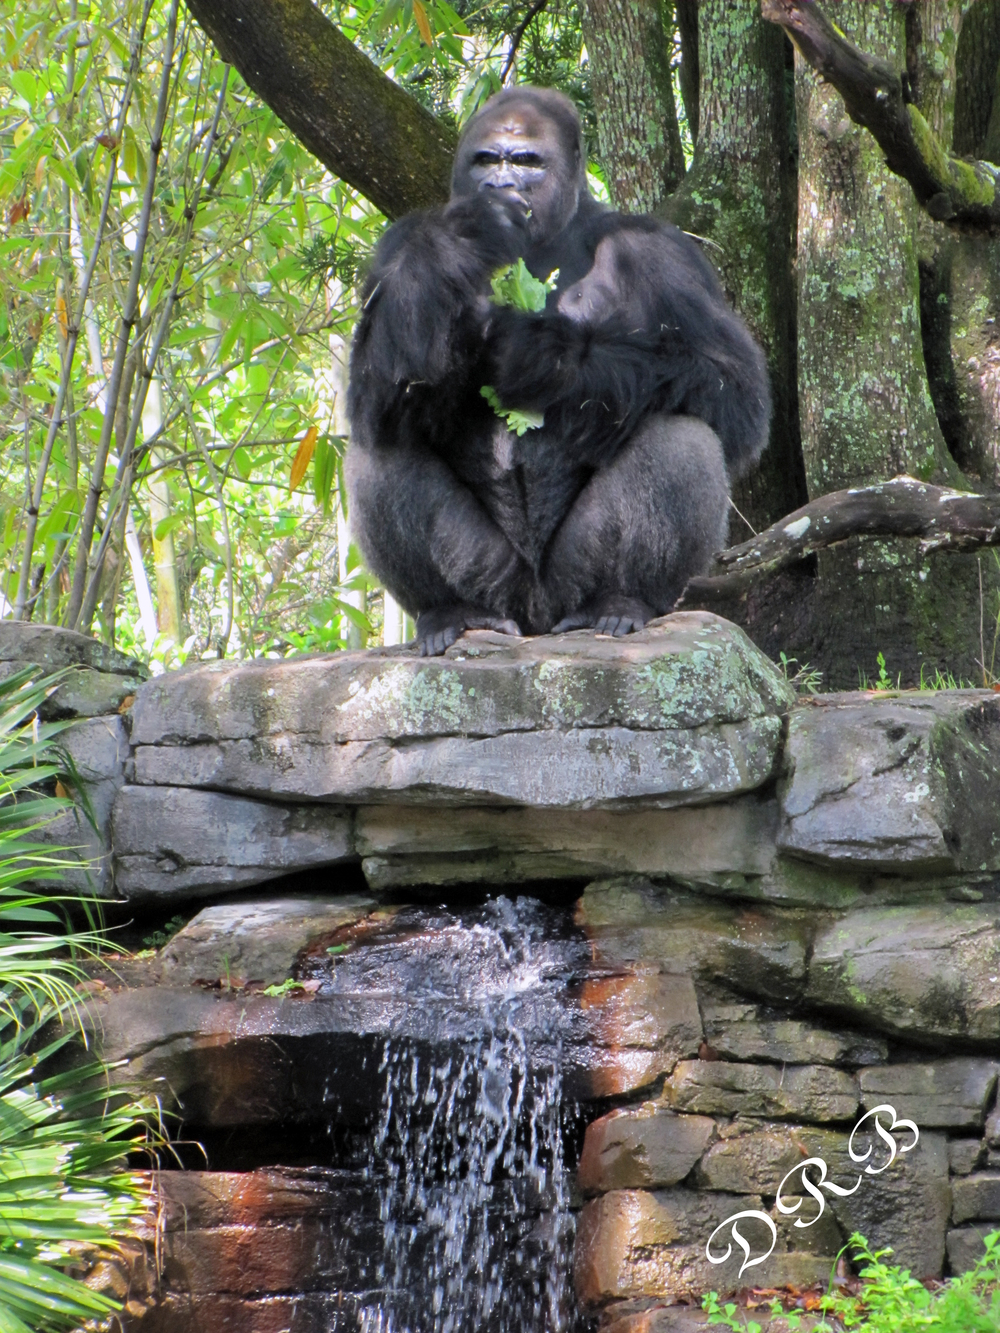 WDW AK Africa Pangani Forest Exploration Trail Gorilla 026.JPG